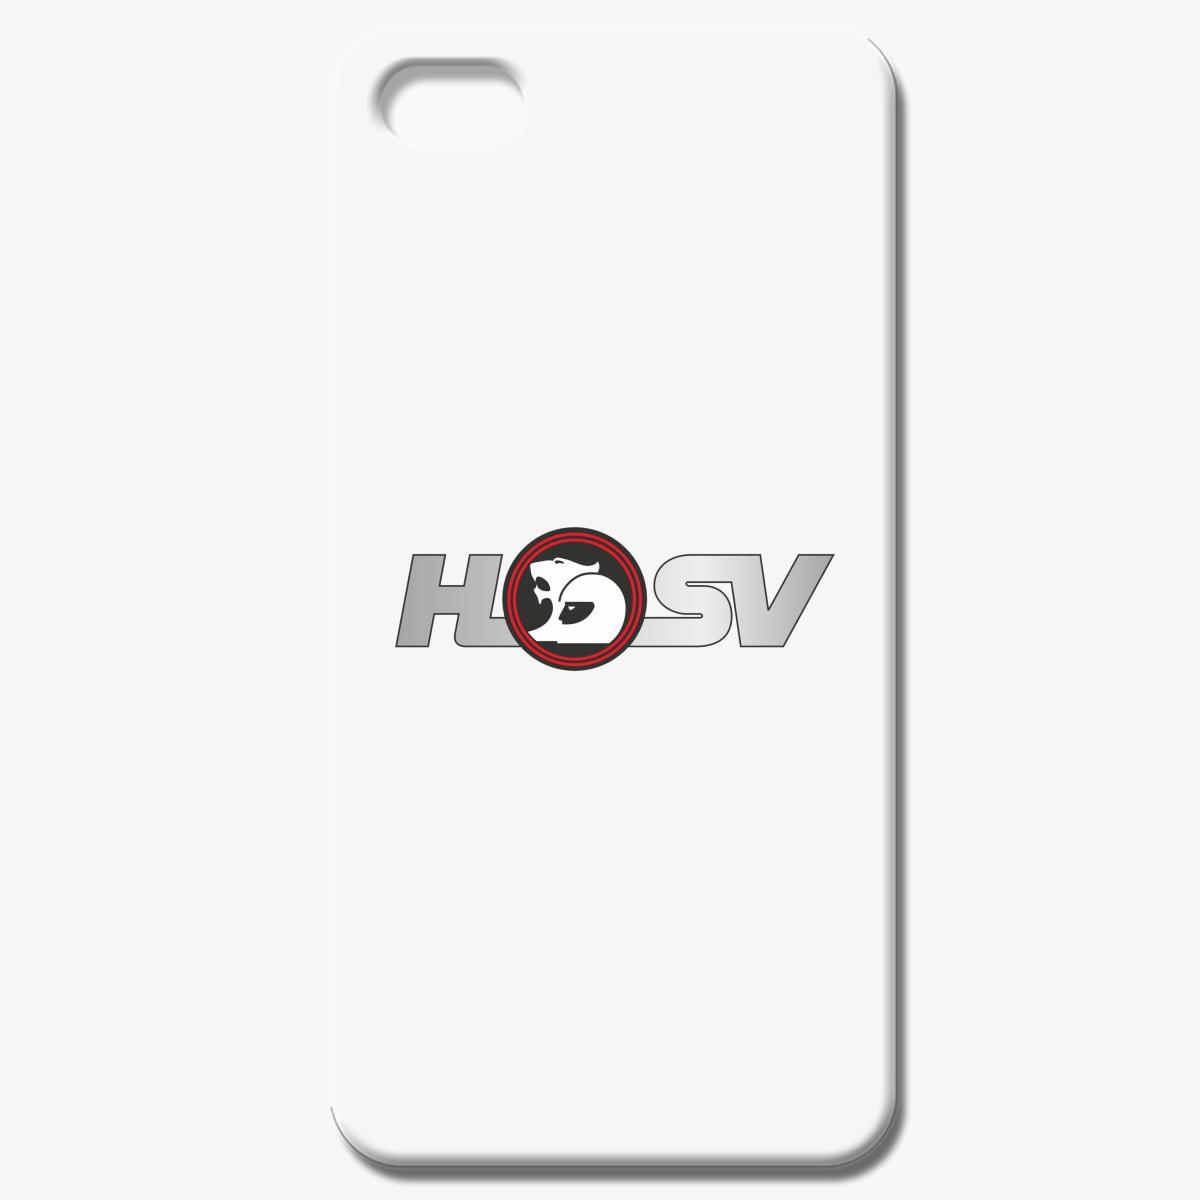 Holden Hosv Iphone 8 Case